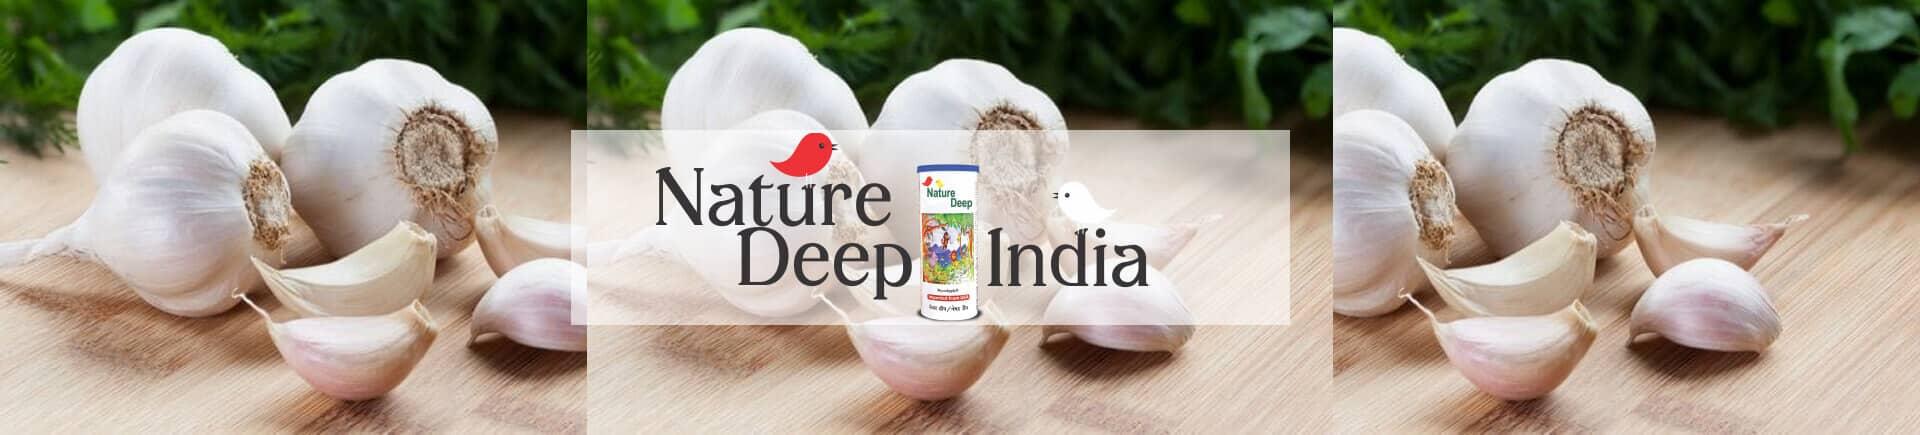 sumitomo naturedeep for garlic crop desktop banner